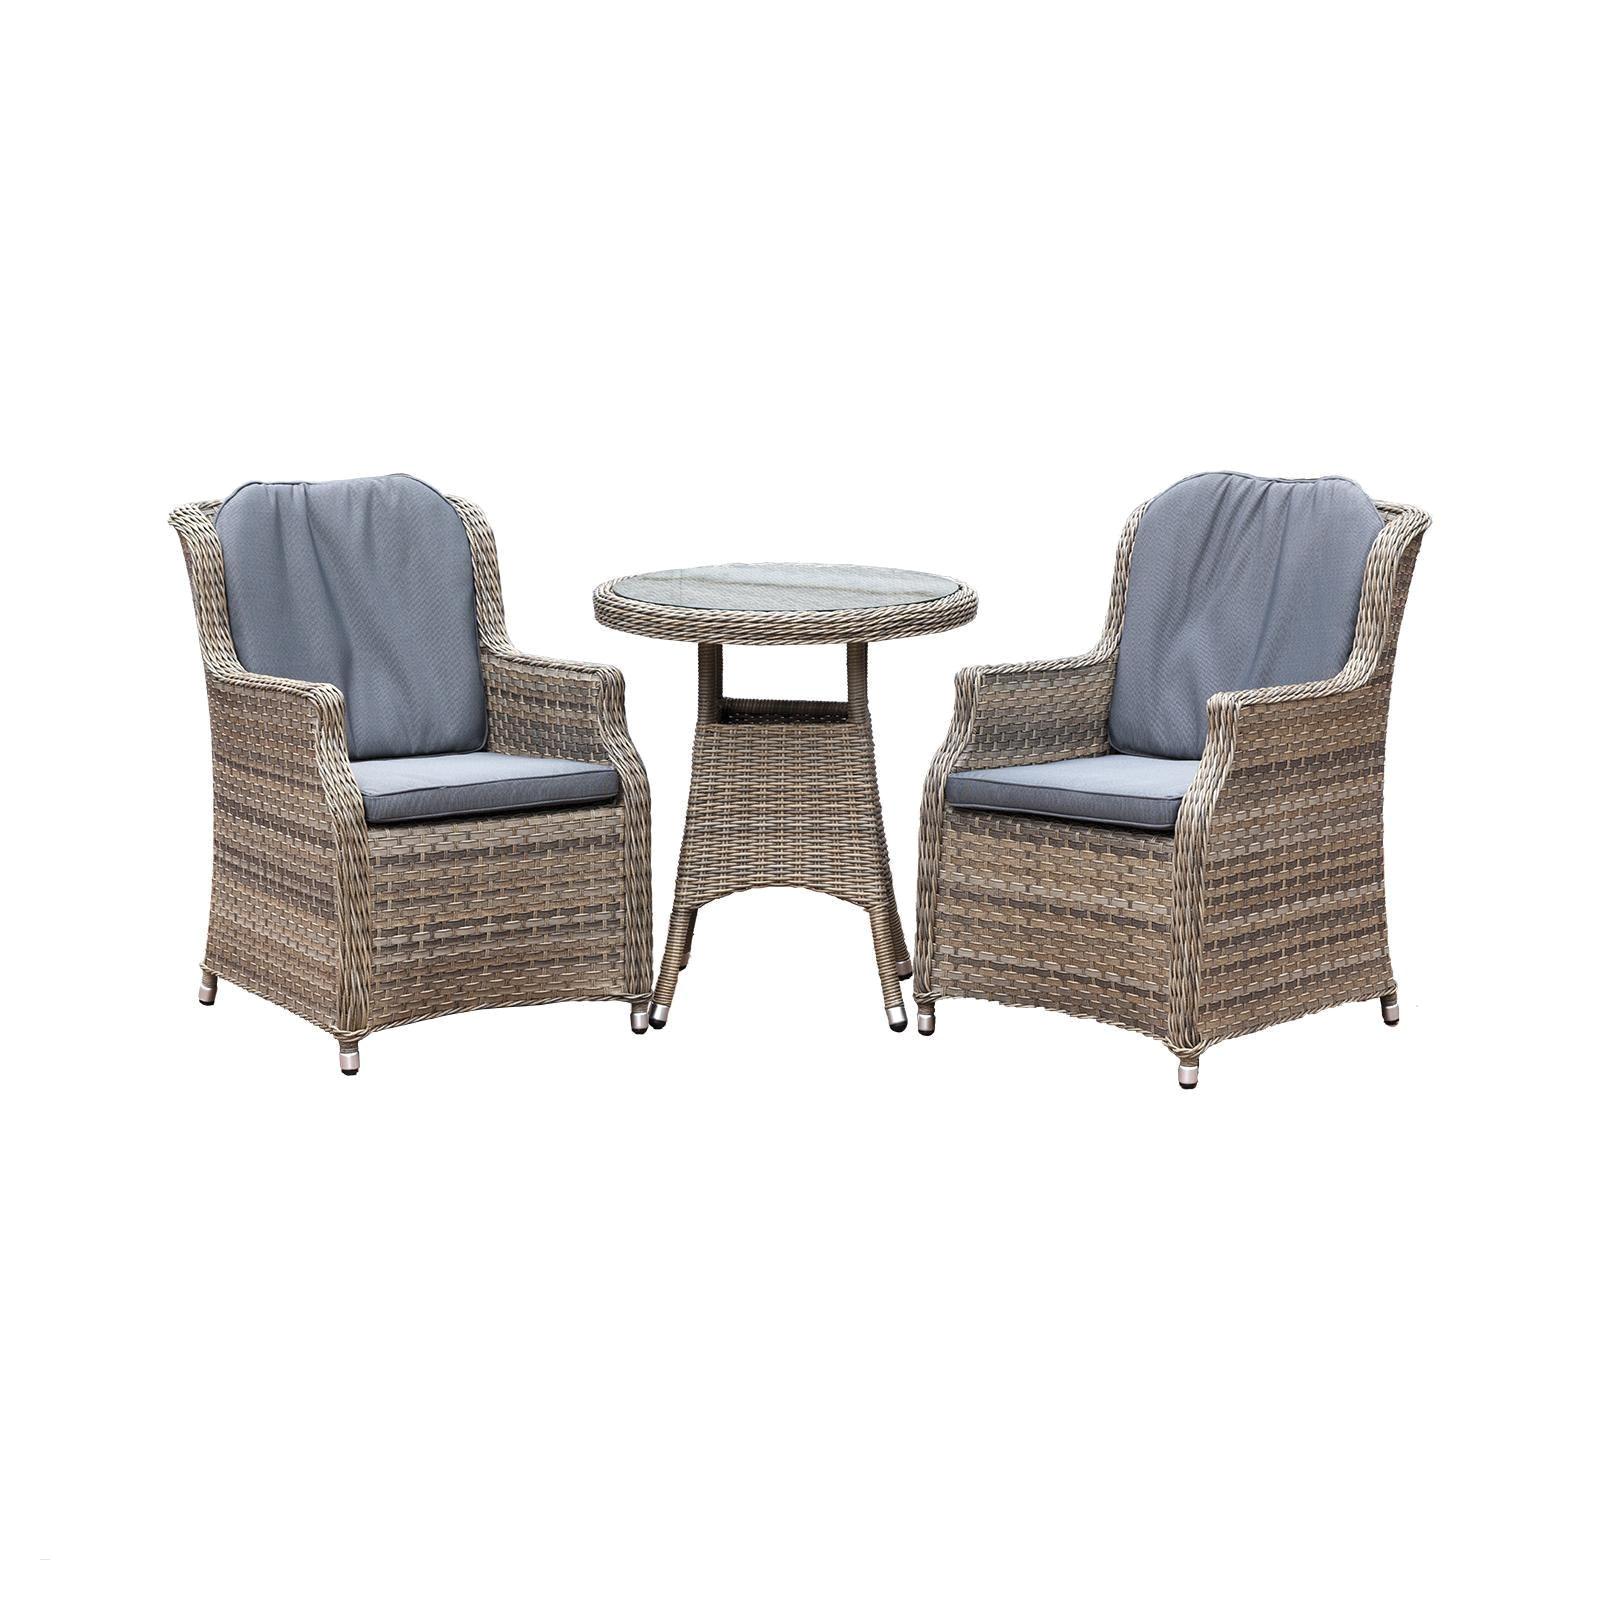 garden furniture sale luxury furniture wicker loveseat elegant wicker outdoor sofa 0d patio 39 popular